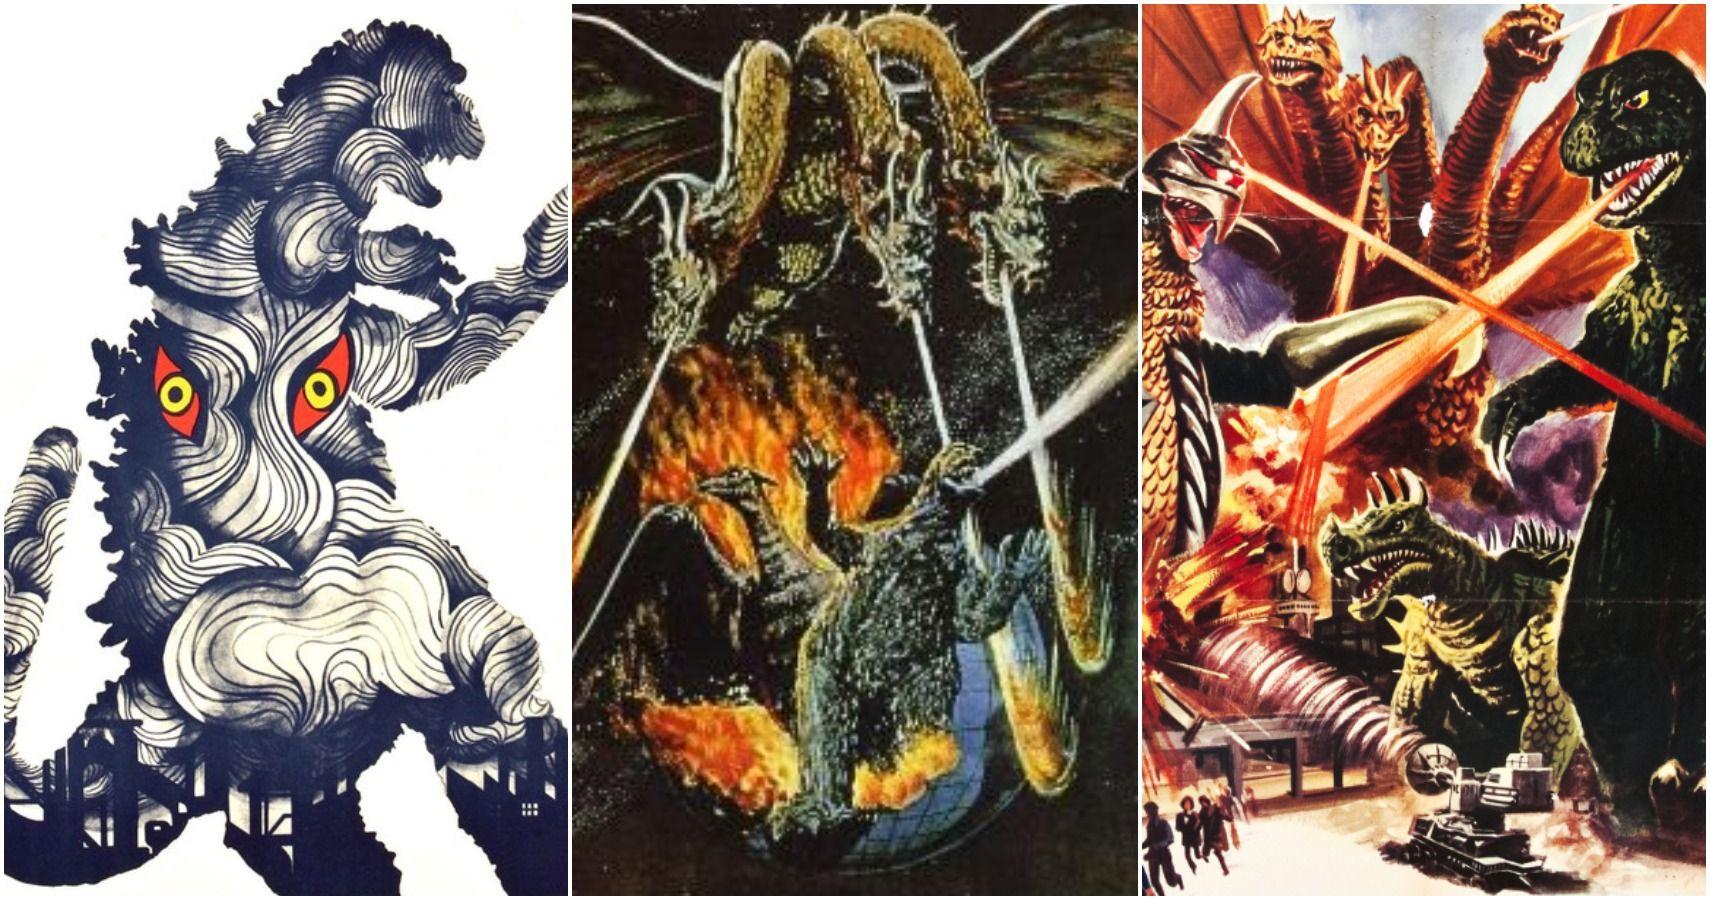 The 10 Best Showa Era Godzilla Movies (According To Rotten ...